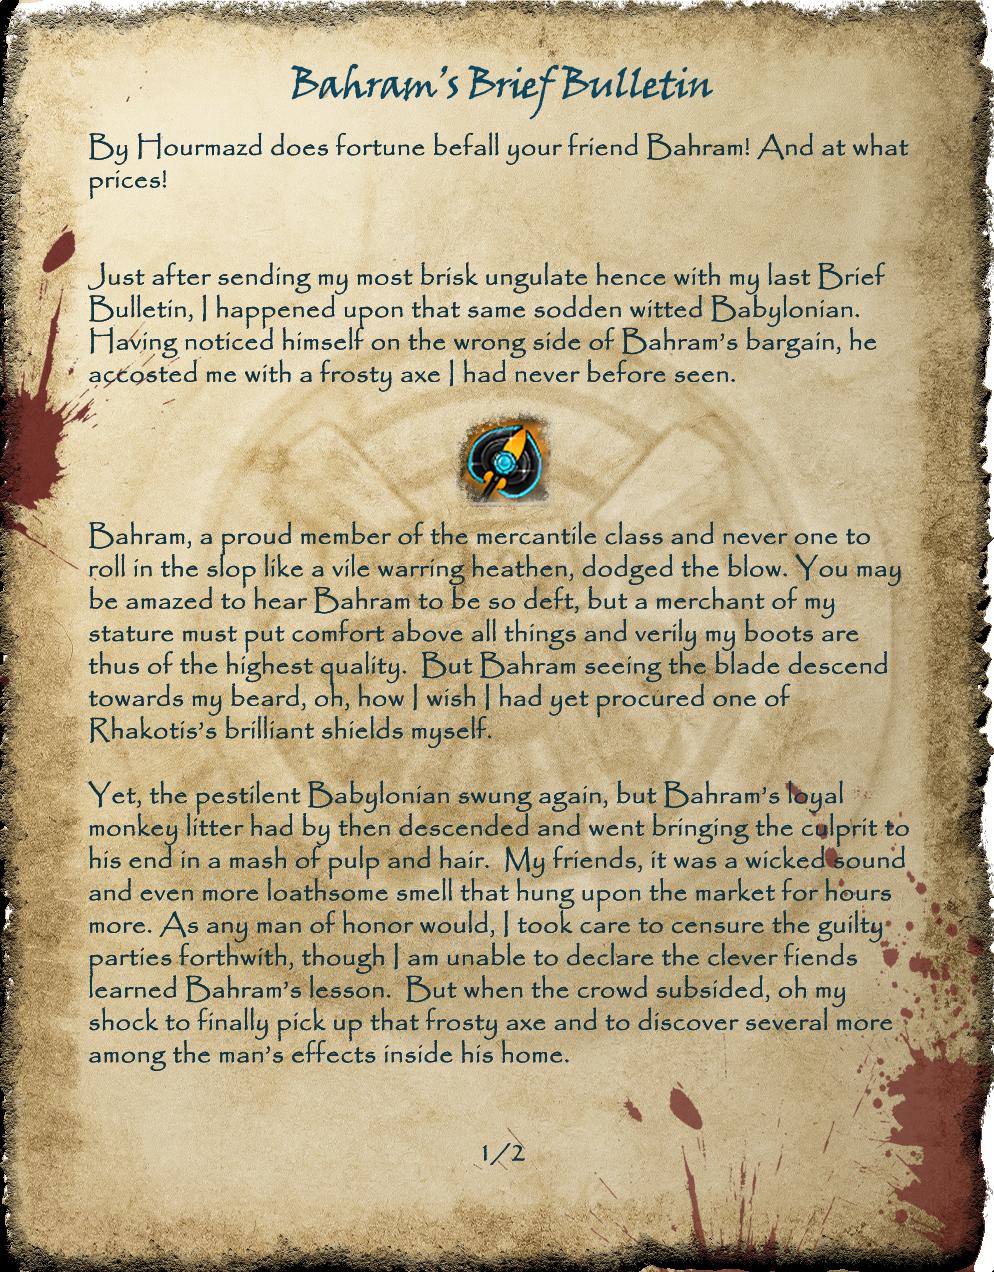 BahramsBriefBulletin4-Page1.png